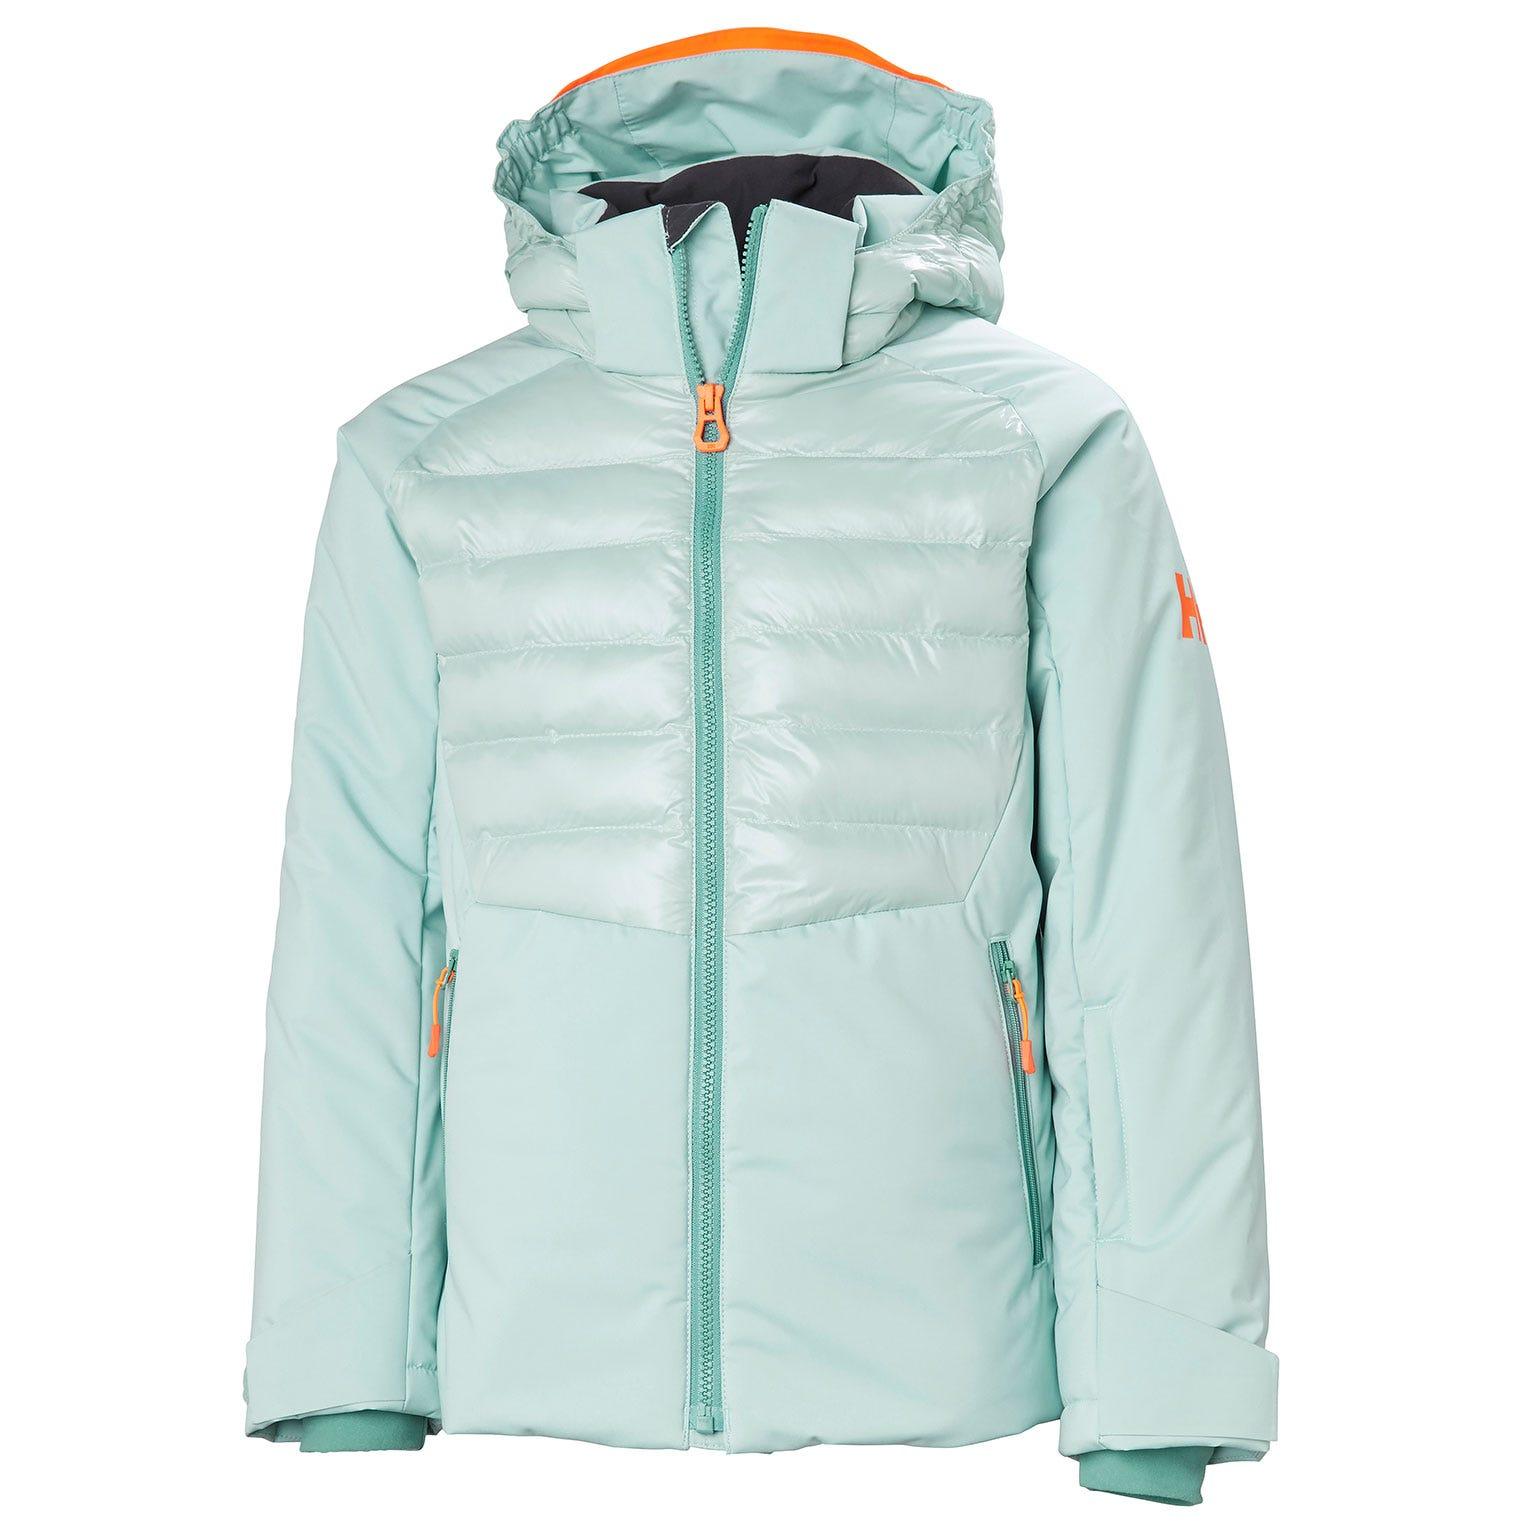 Helly Hansen Junior Snowstar Jacket Kids Blue 140/10